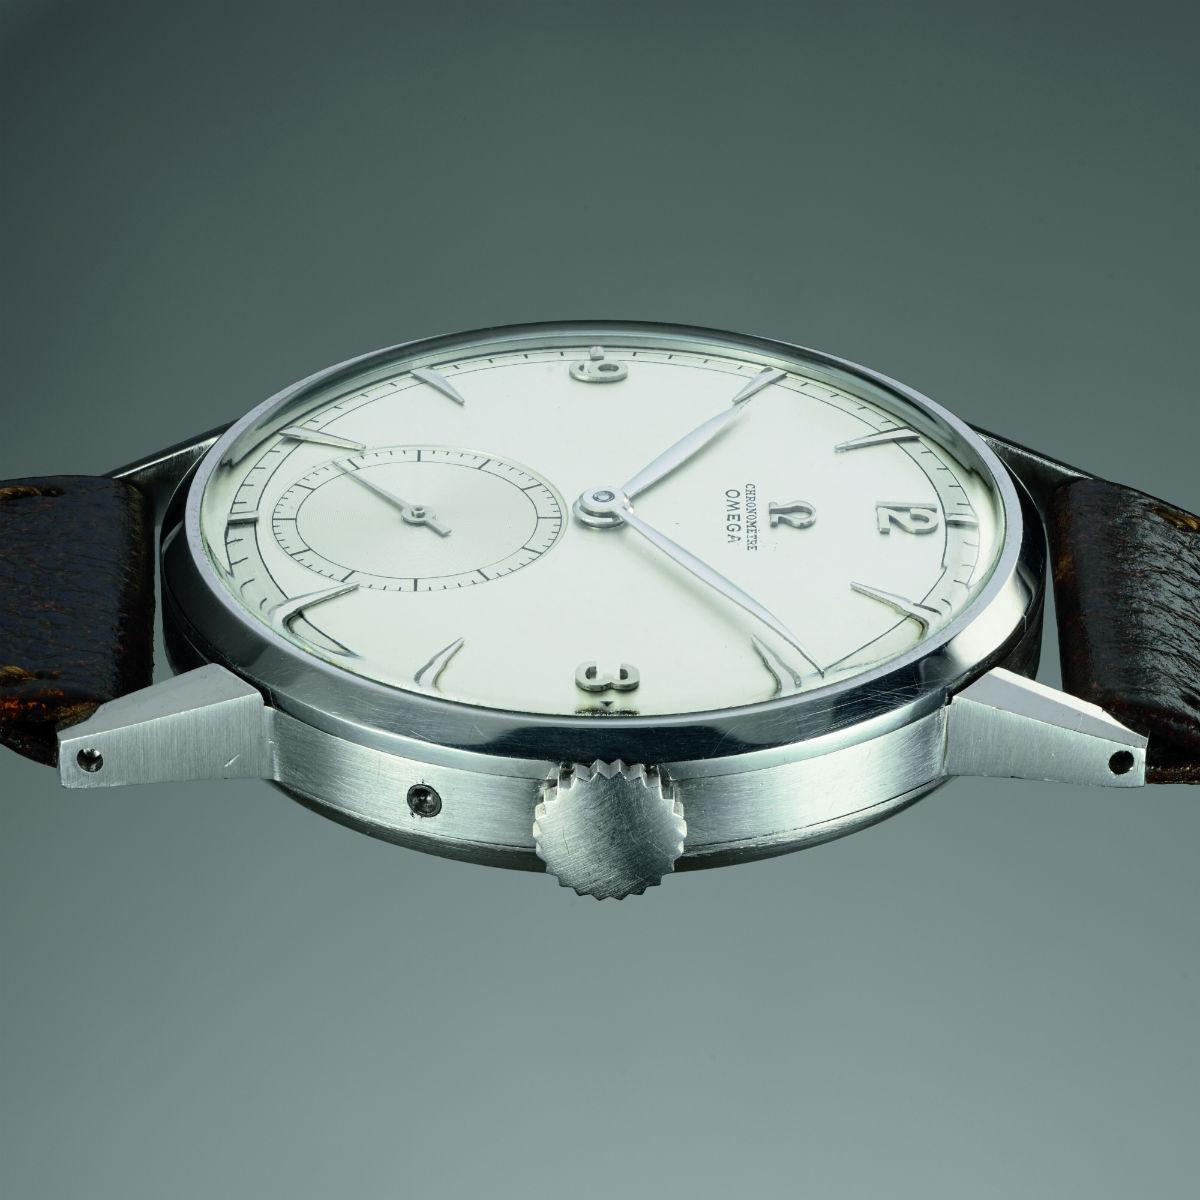 Omega Tourbillon 30 I in acciaio (1947) - credit: Phillips Watches